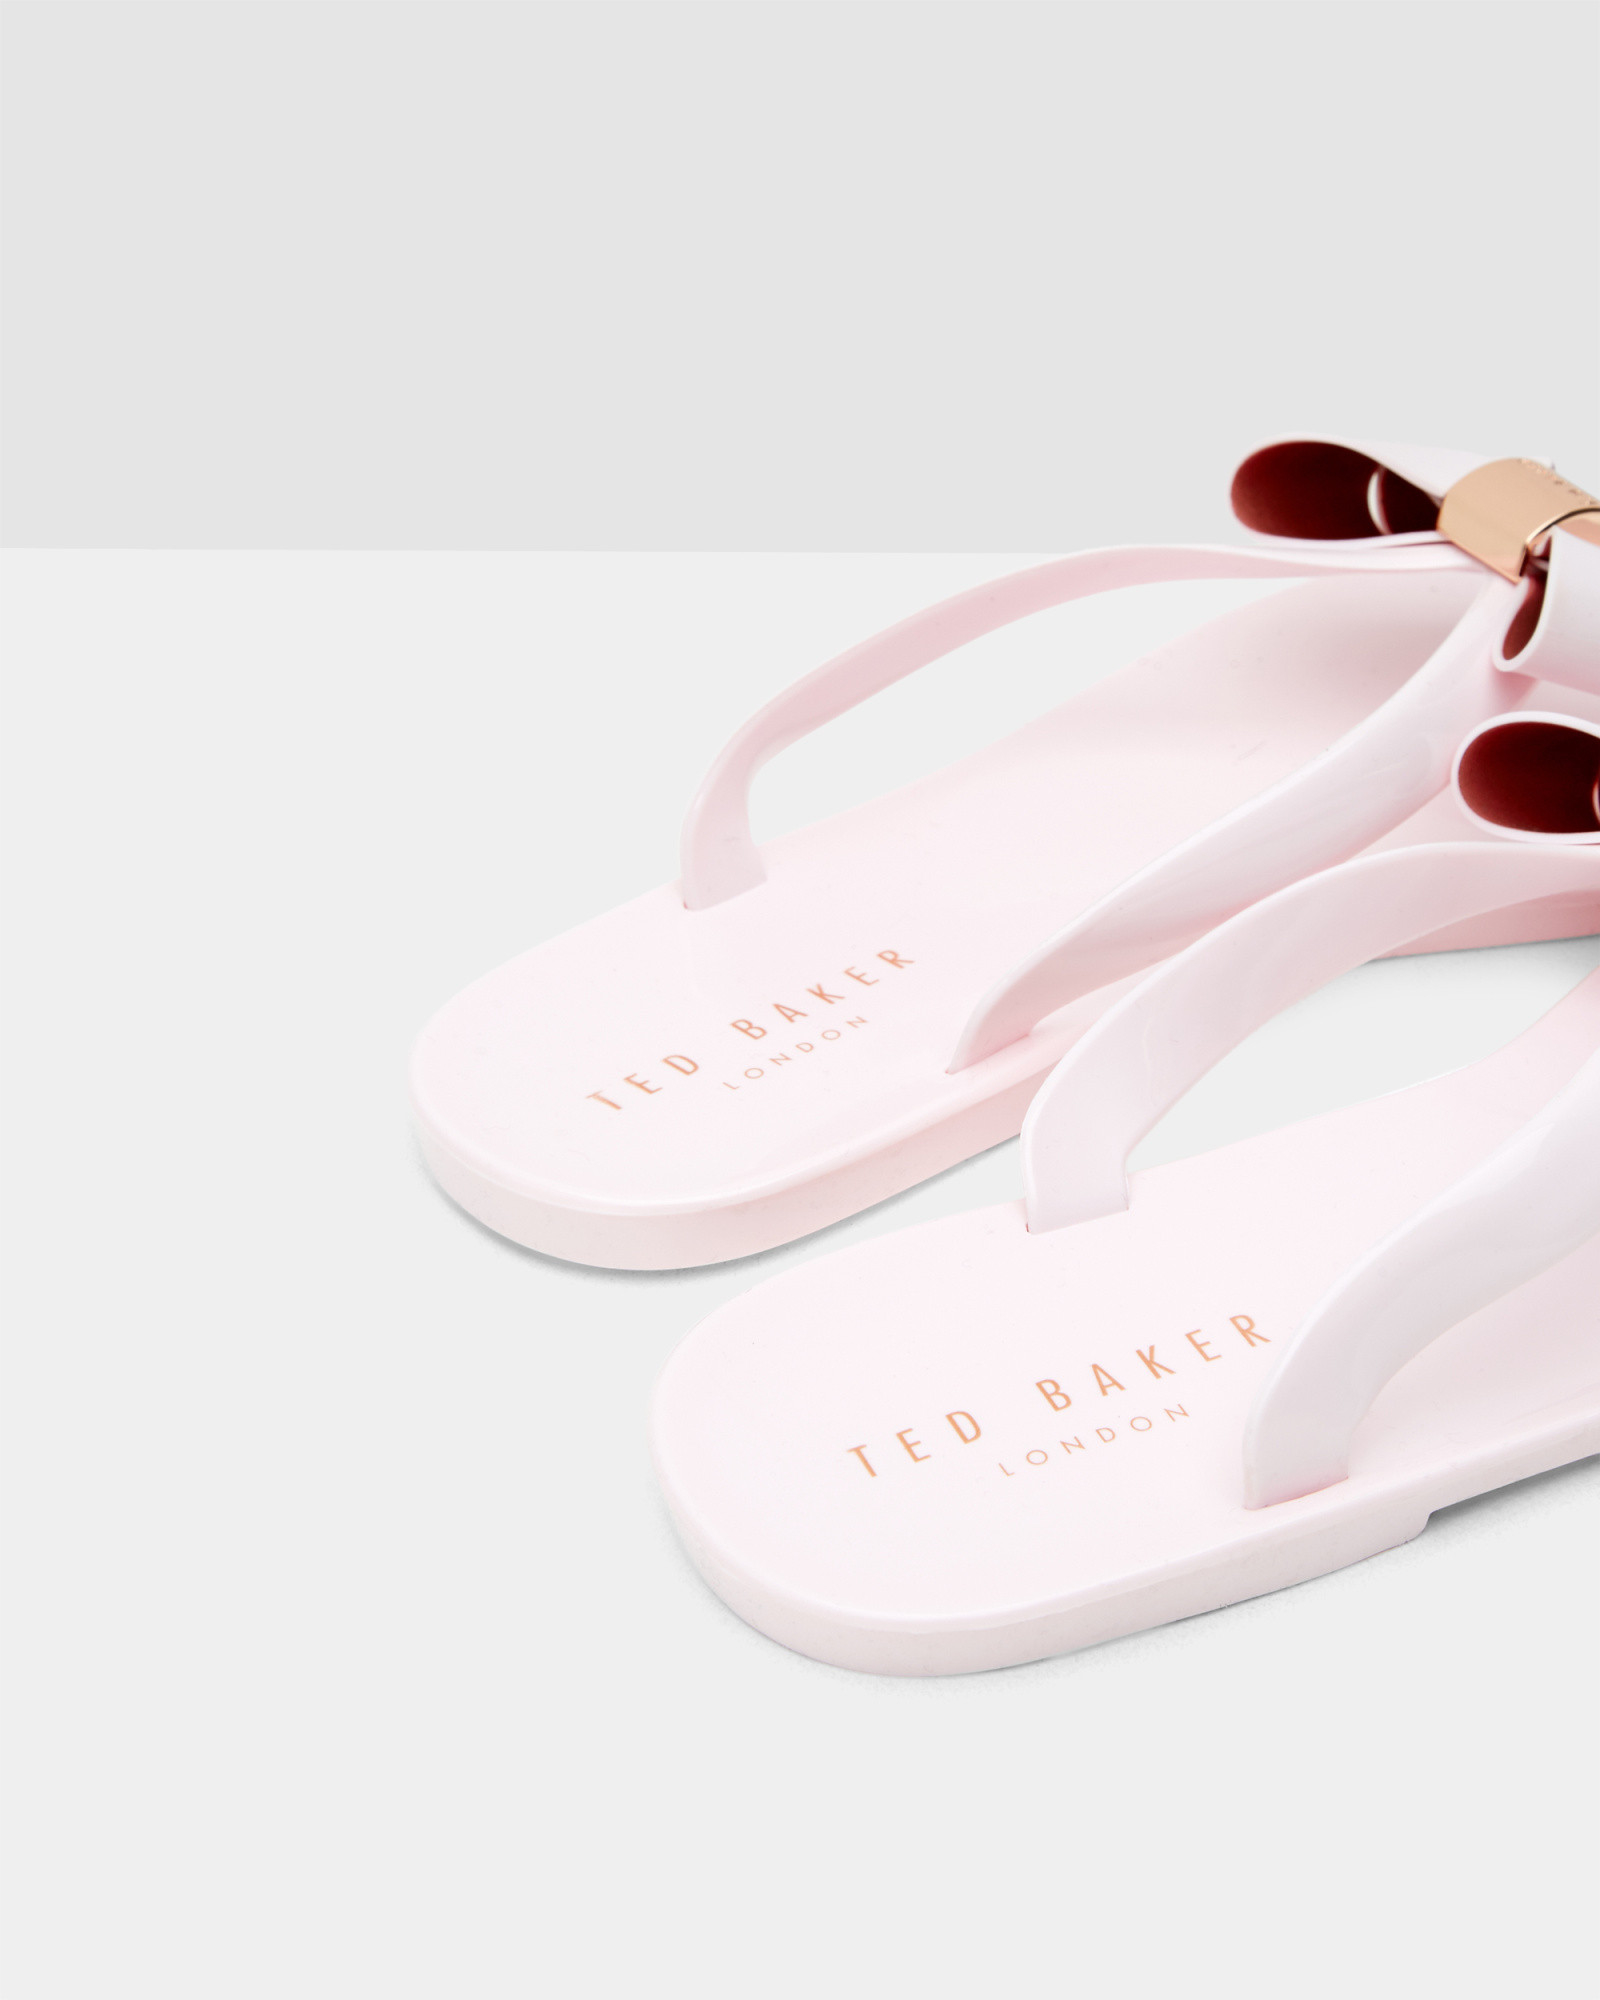 95821180b0b6 Lyst - Ted Baker Bow Flip Flops in Pink